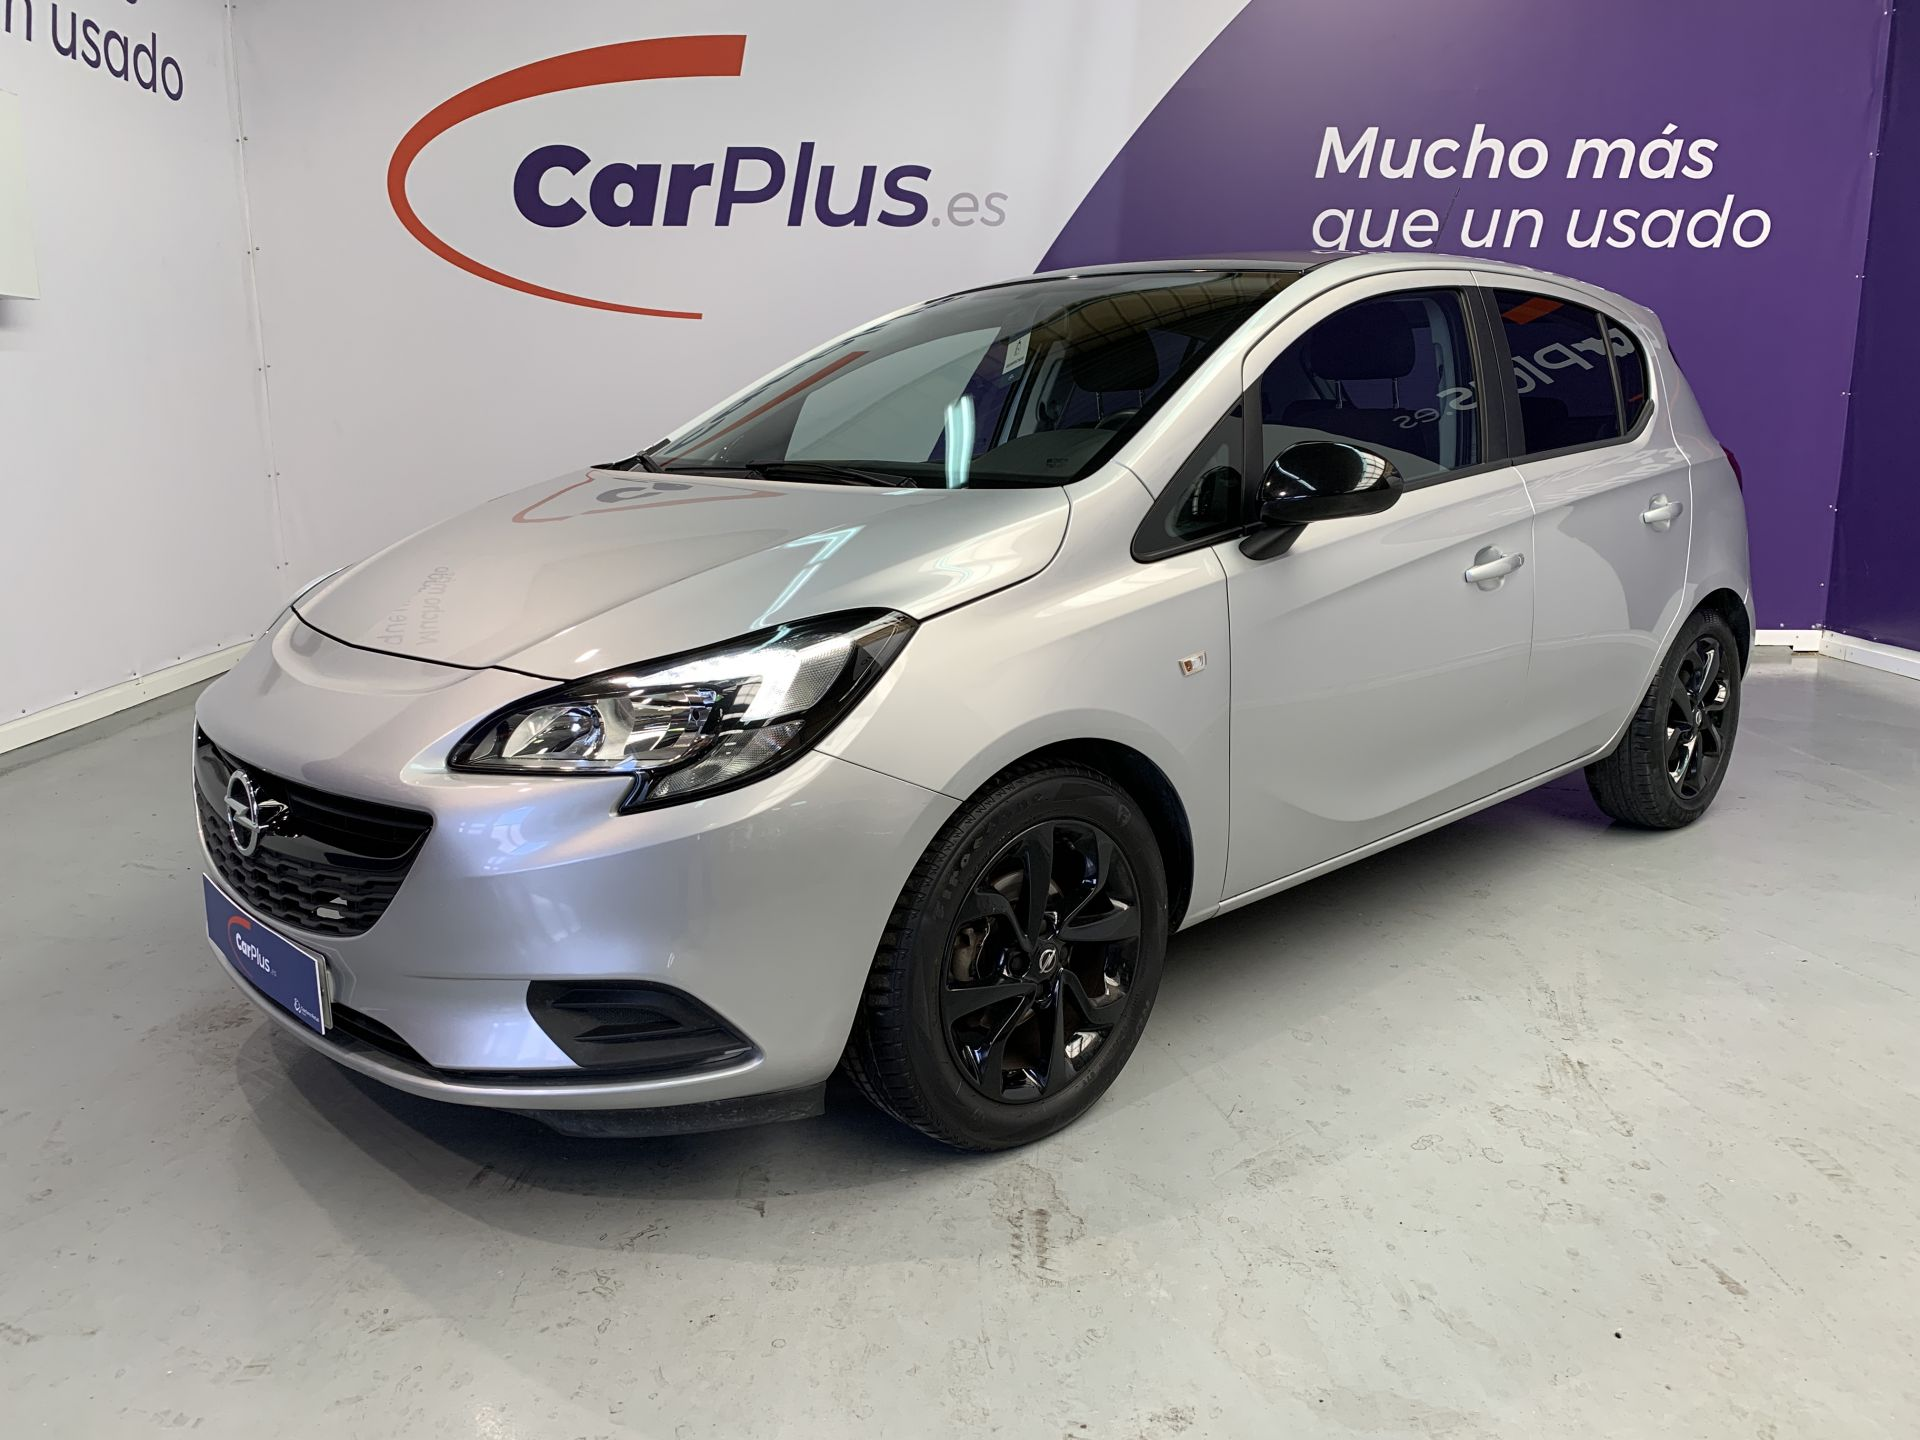 Opel Corsa 1.4 Color Edition 90 CV segunda mano Madrid